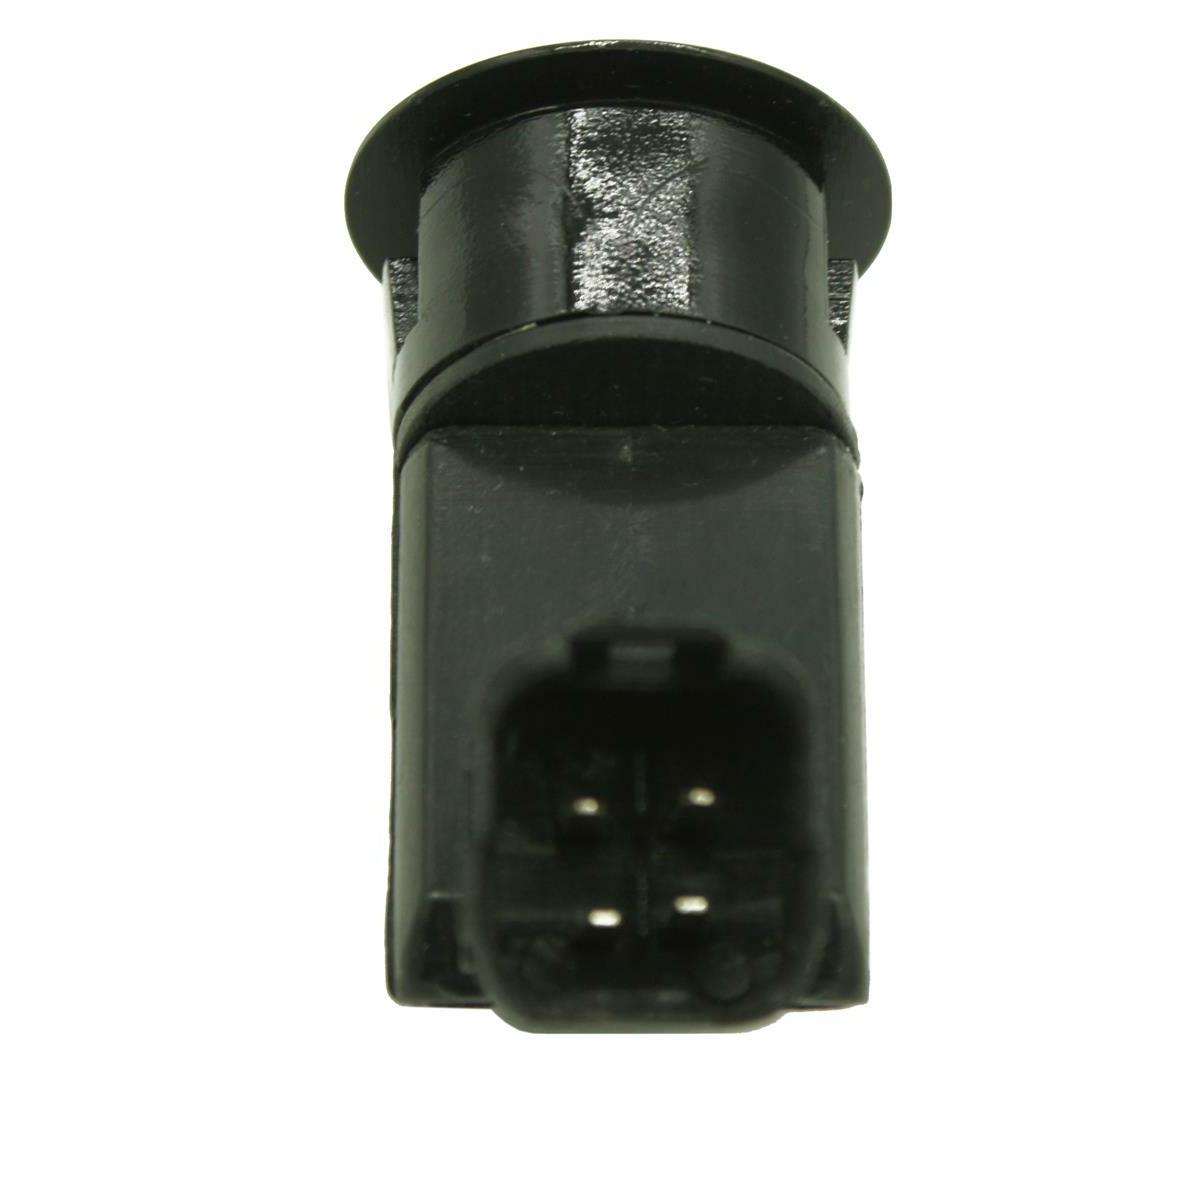 Park sensor 13K236CAJAHC for Ford PDC Parktronic